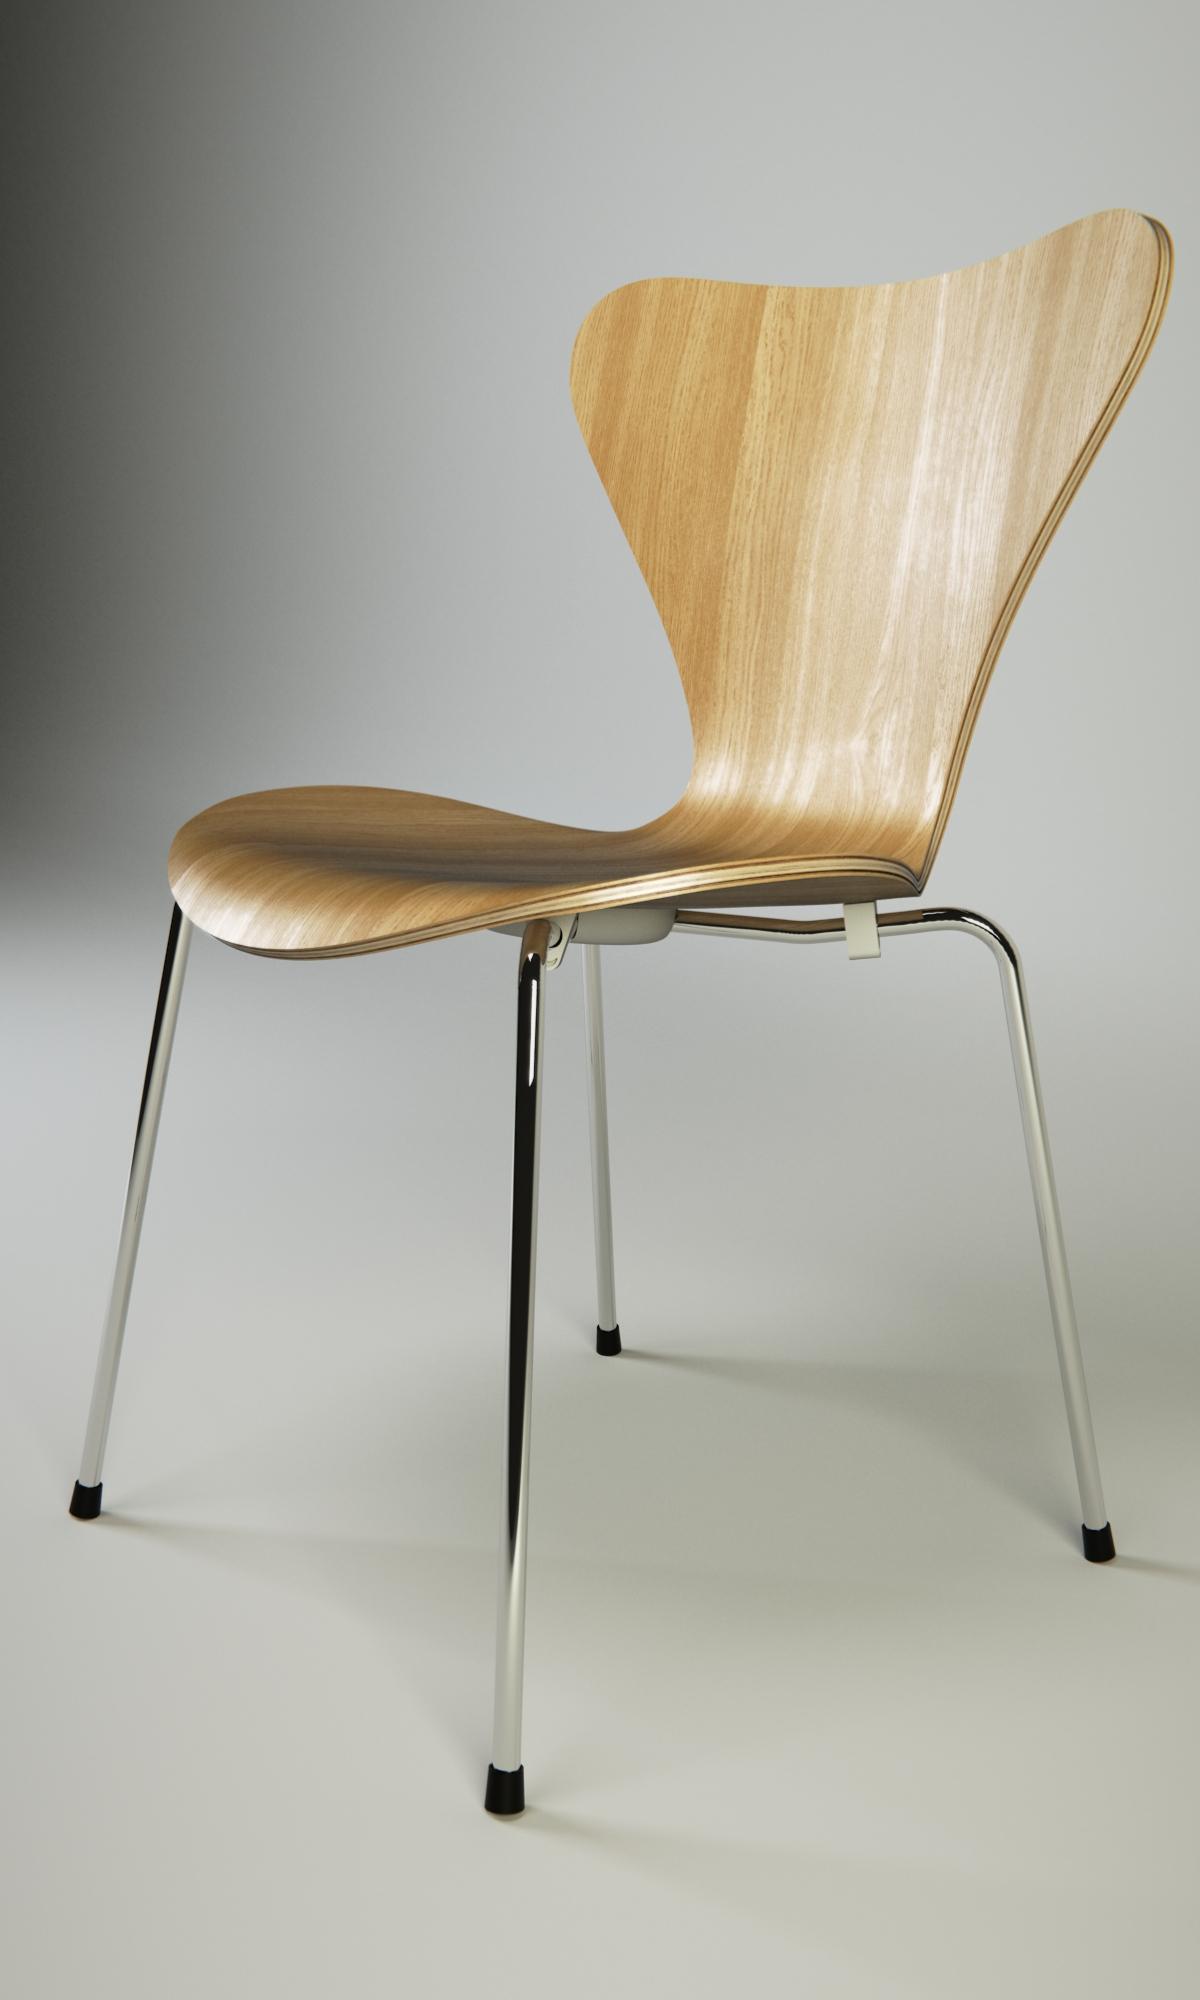 Series 7 Chair by AlejandroSotoB on DeviantArt